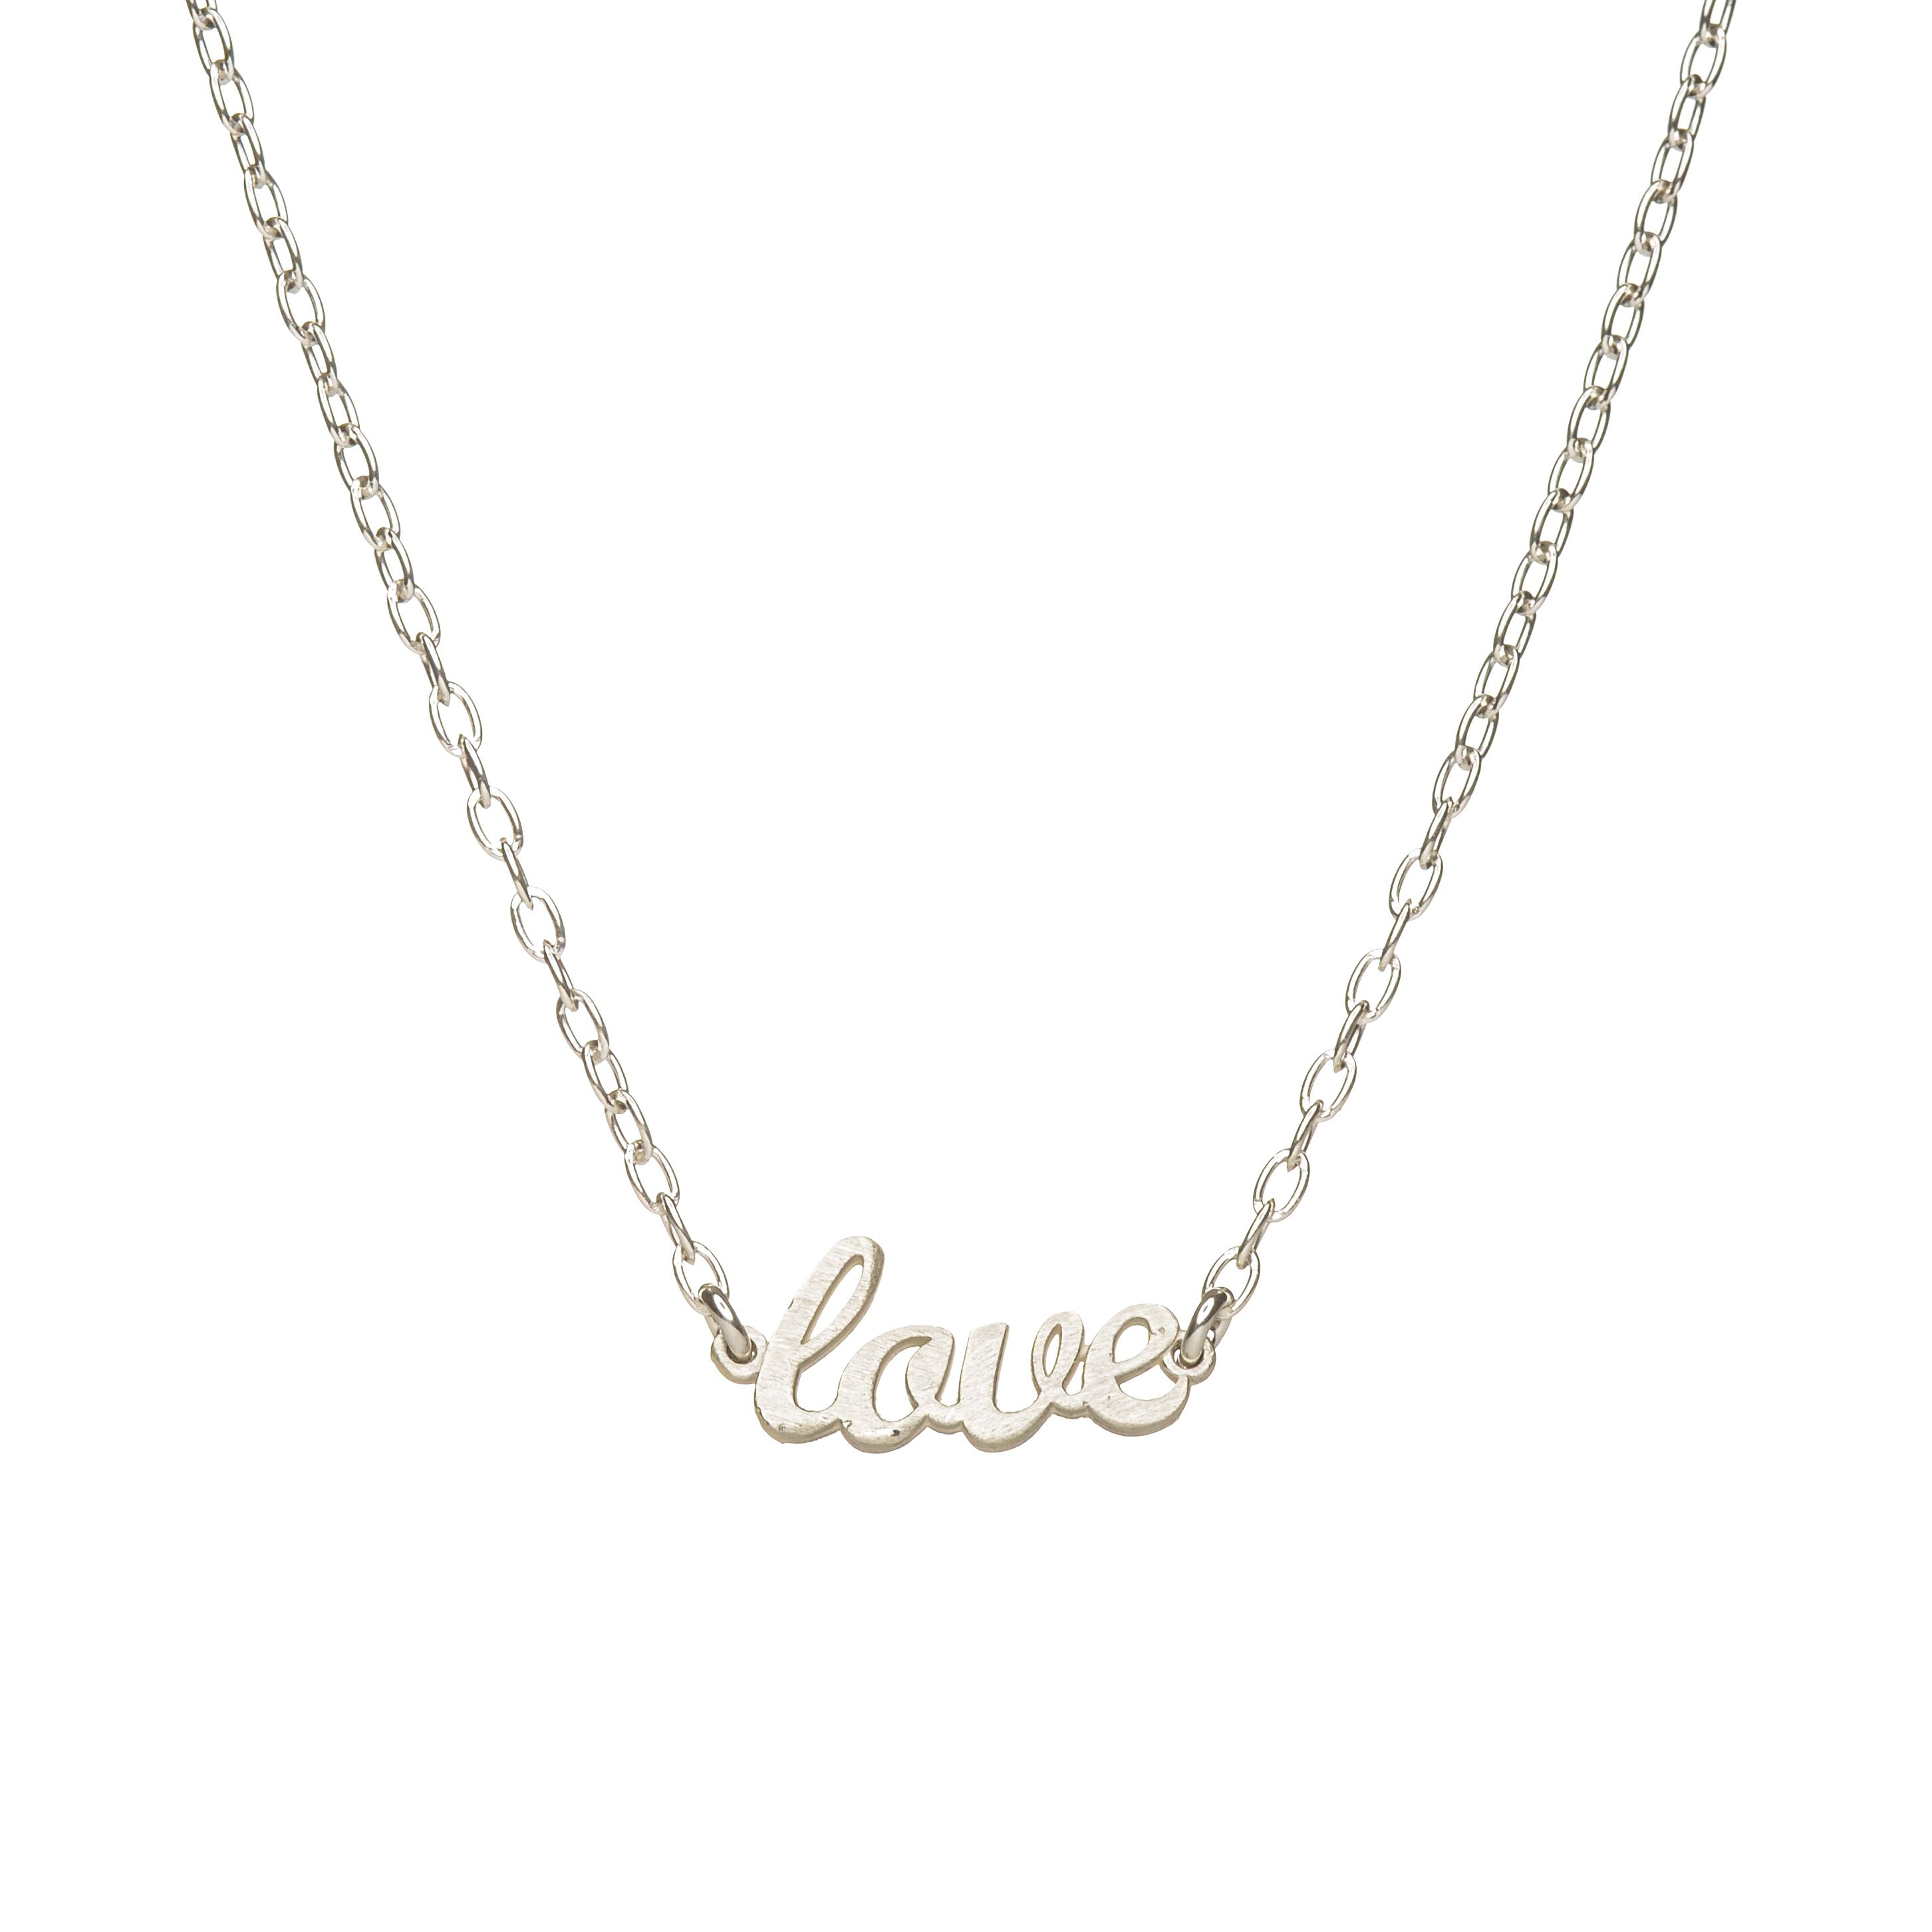 Love handwritten necklace sterling silver